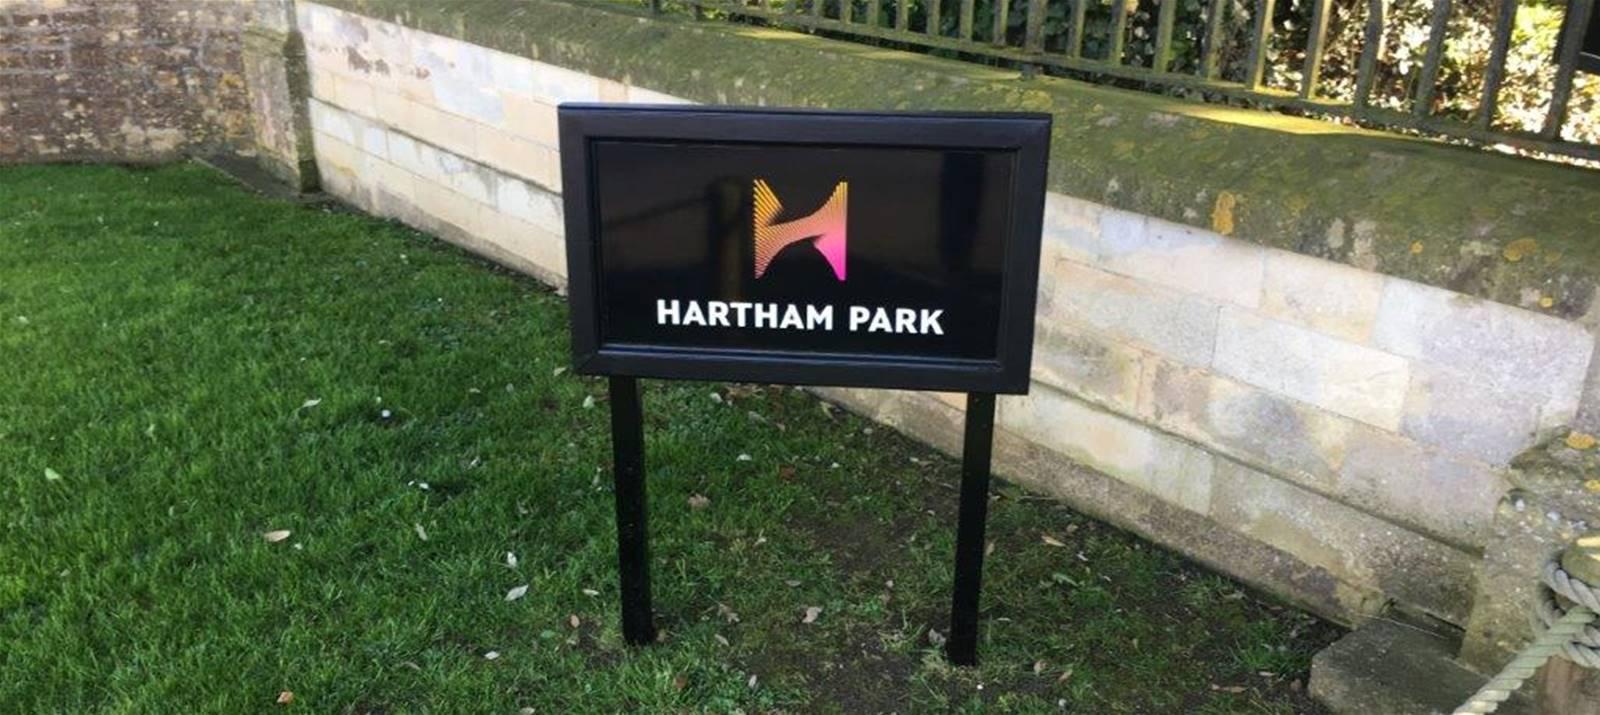 Hartham Park post sign